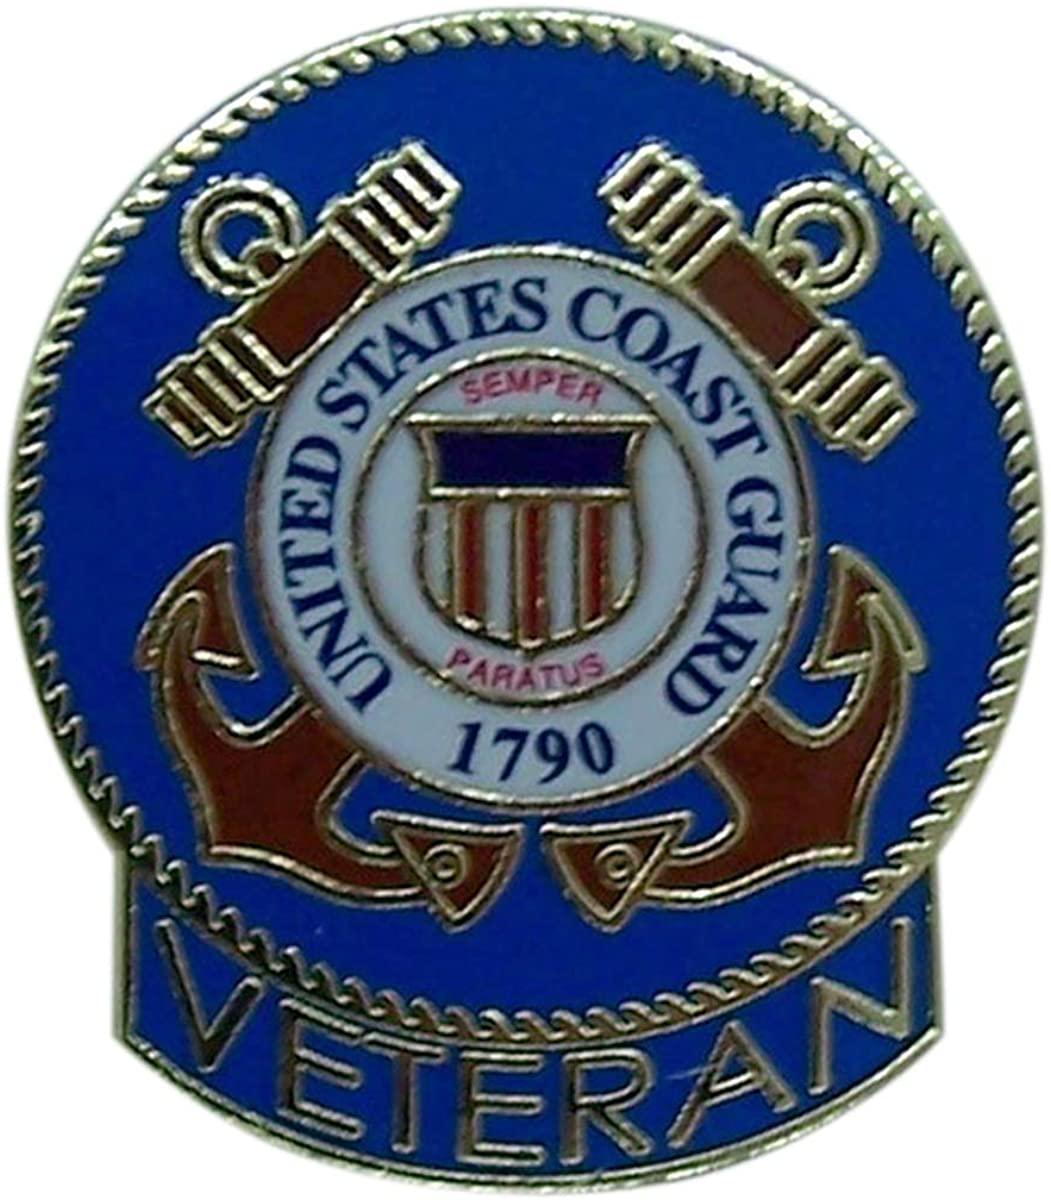 Wowser United States Coast Guard Veteran Lapel Pin, 1 Inch